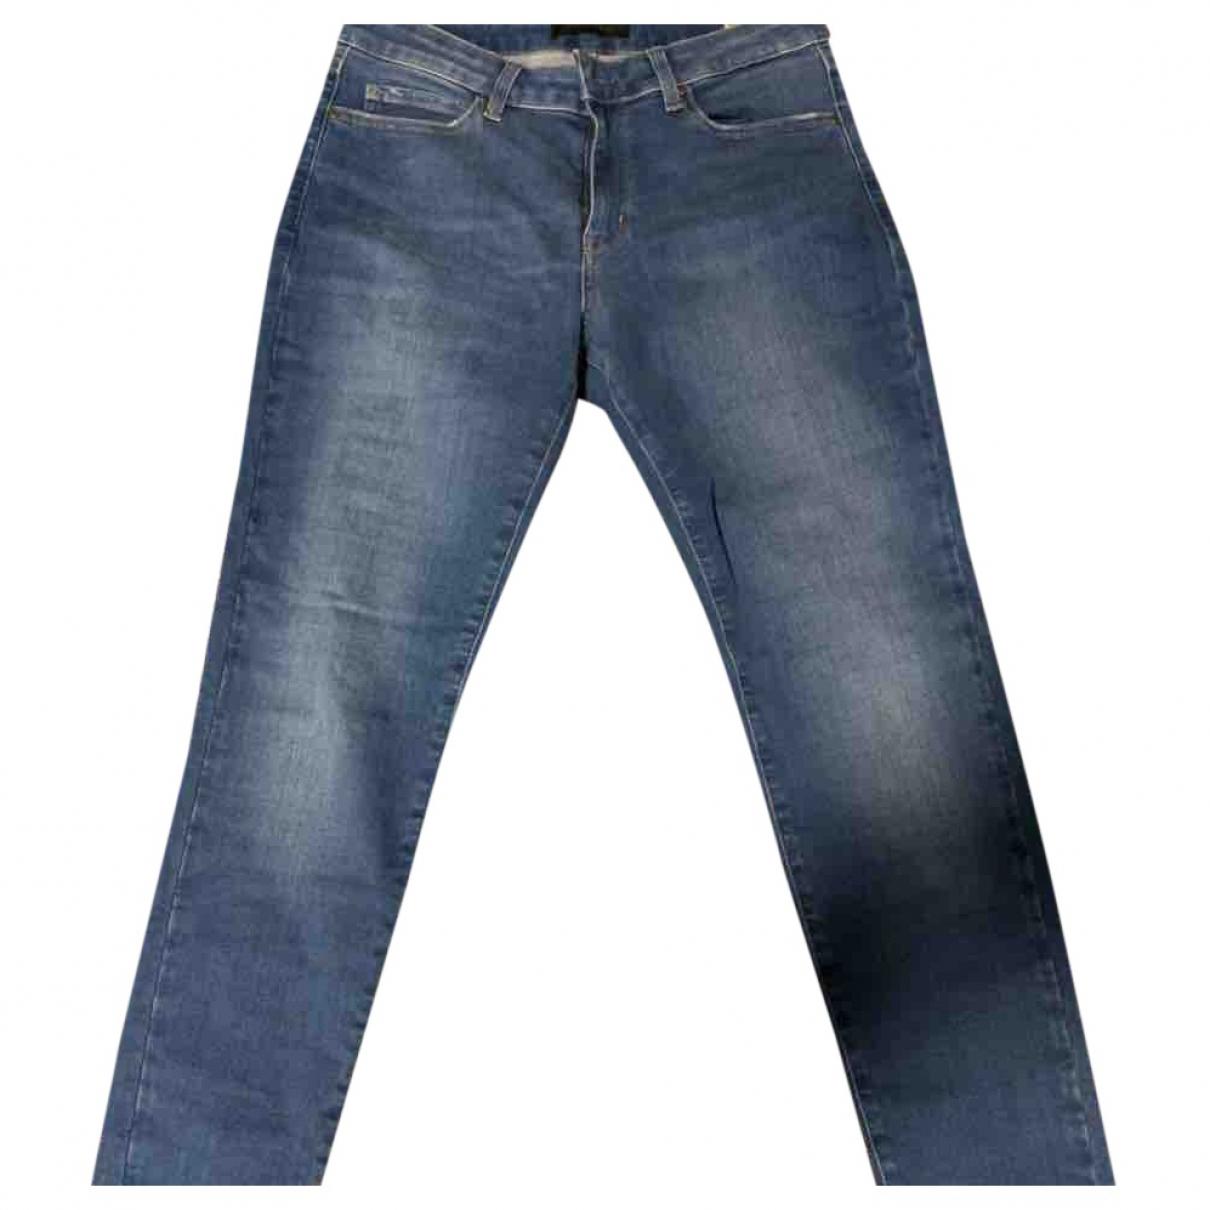 Uniqlo \N Blue Denim - Jeans Jeans for Women 28 US